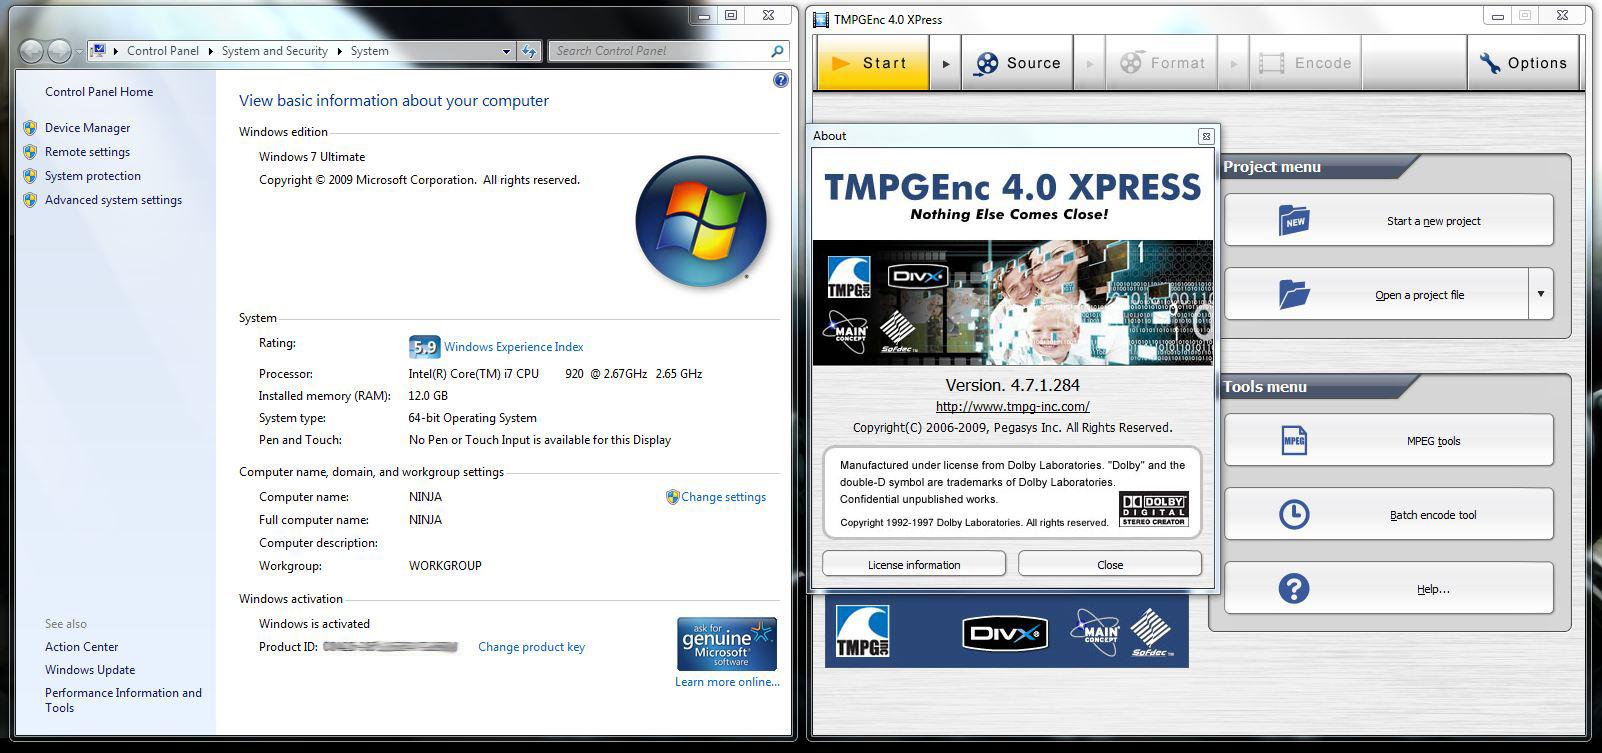 tmpgenc 4.0 xpress 4.3.1.222